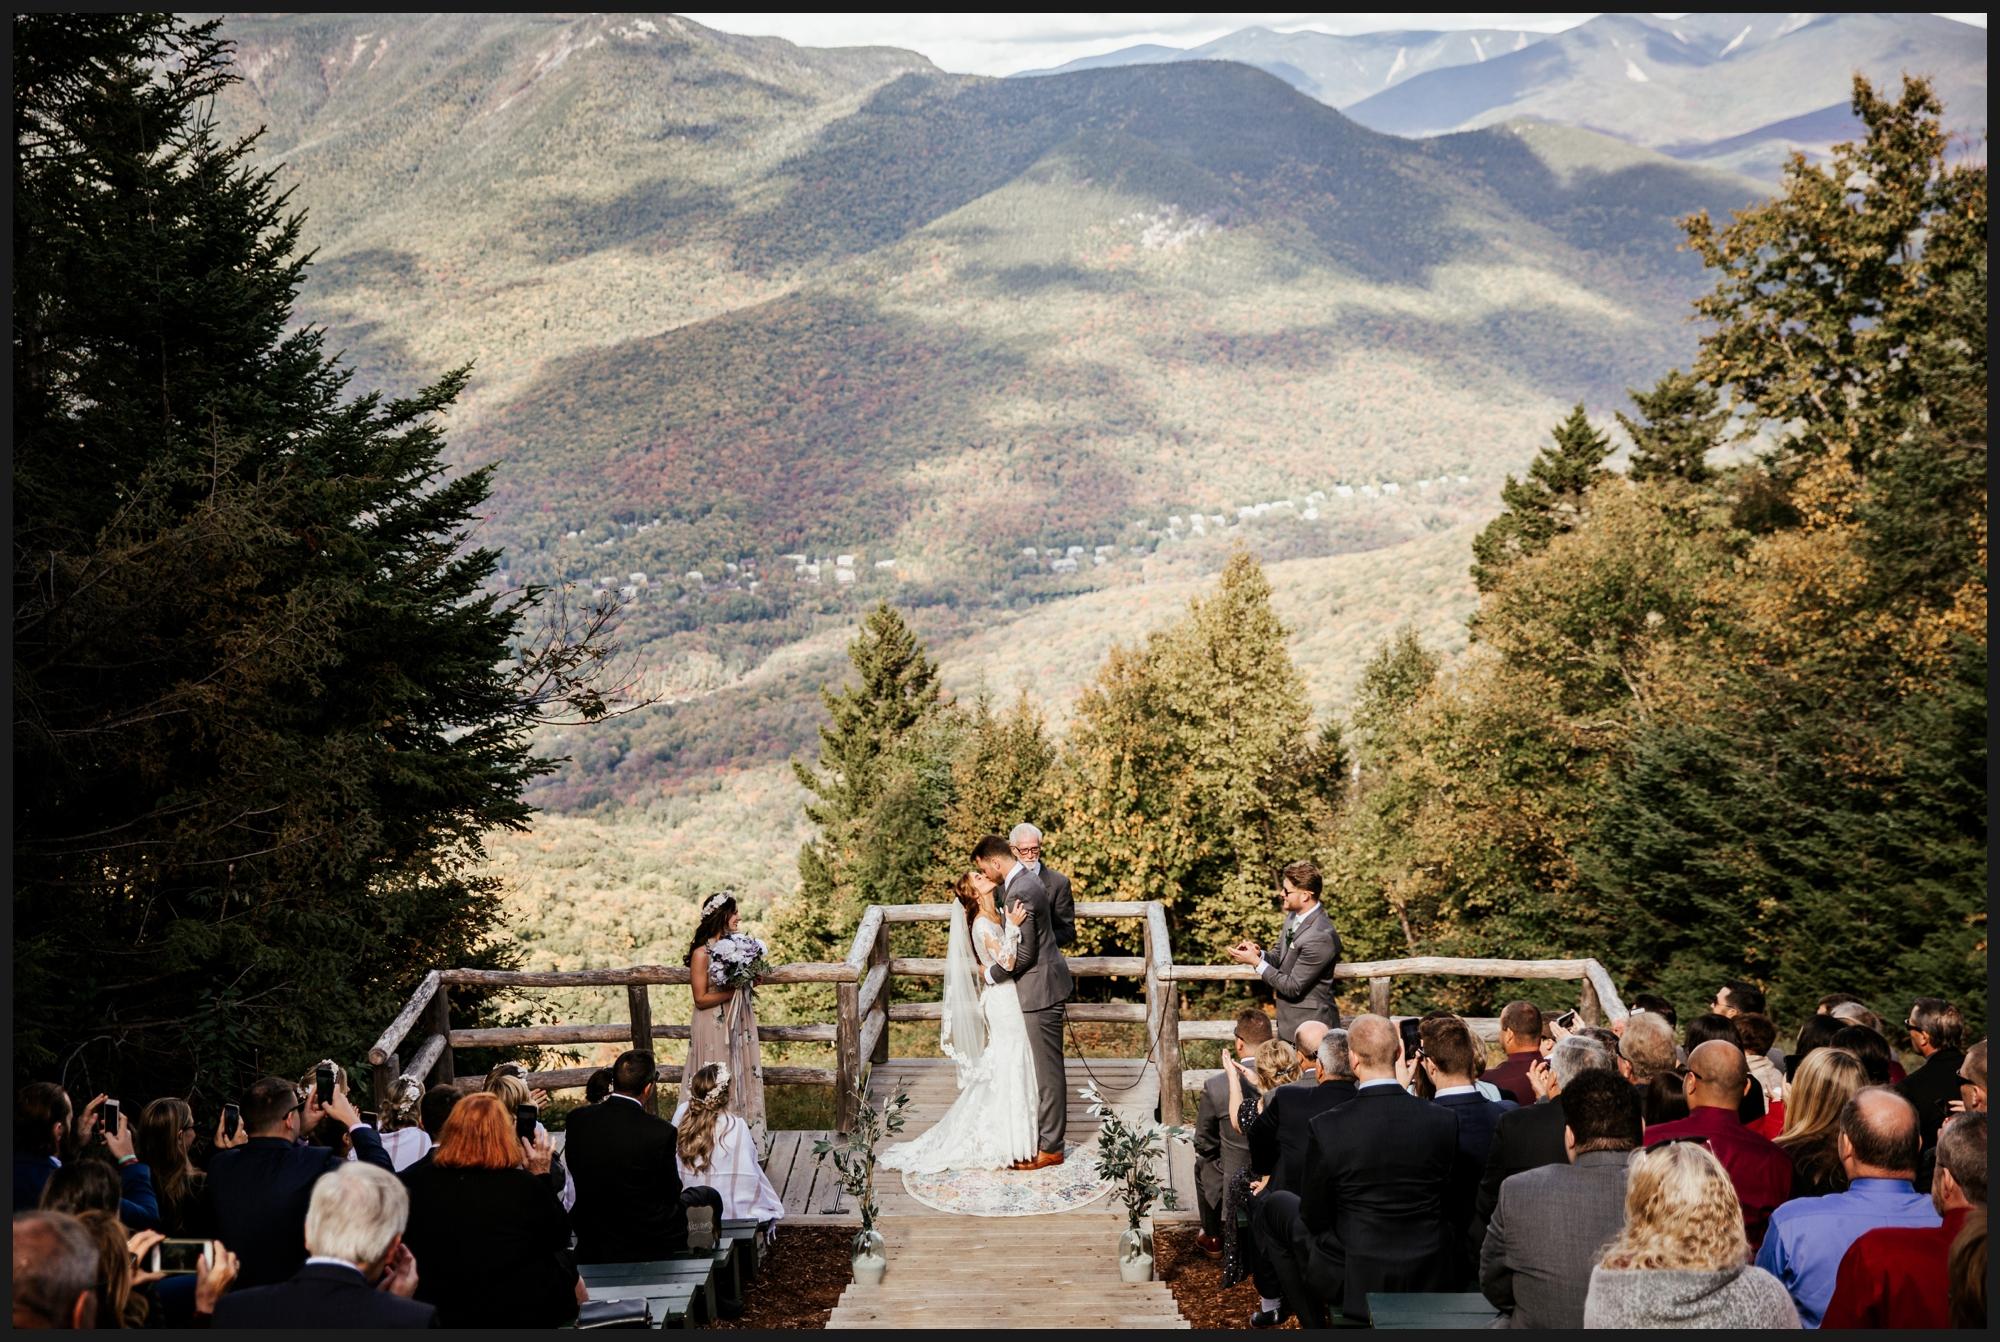 Orlando-Wedding-Photographer-destination-wedding-photographer-florida-wedding-photographer-hawaii-wedding-photographer_0142.jpg